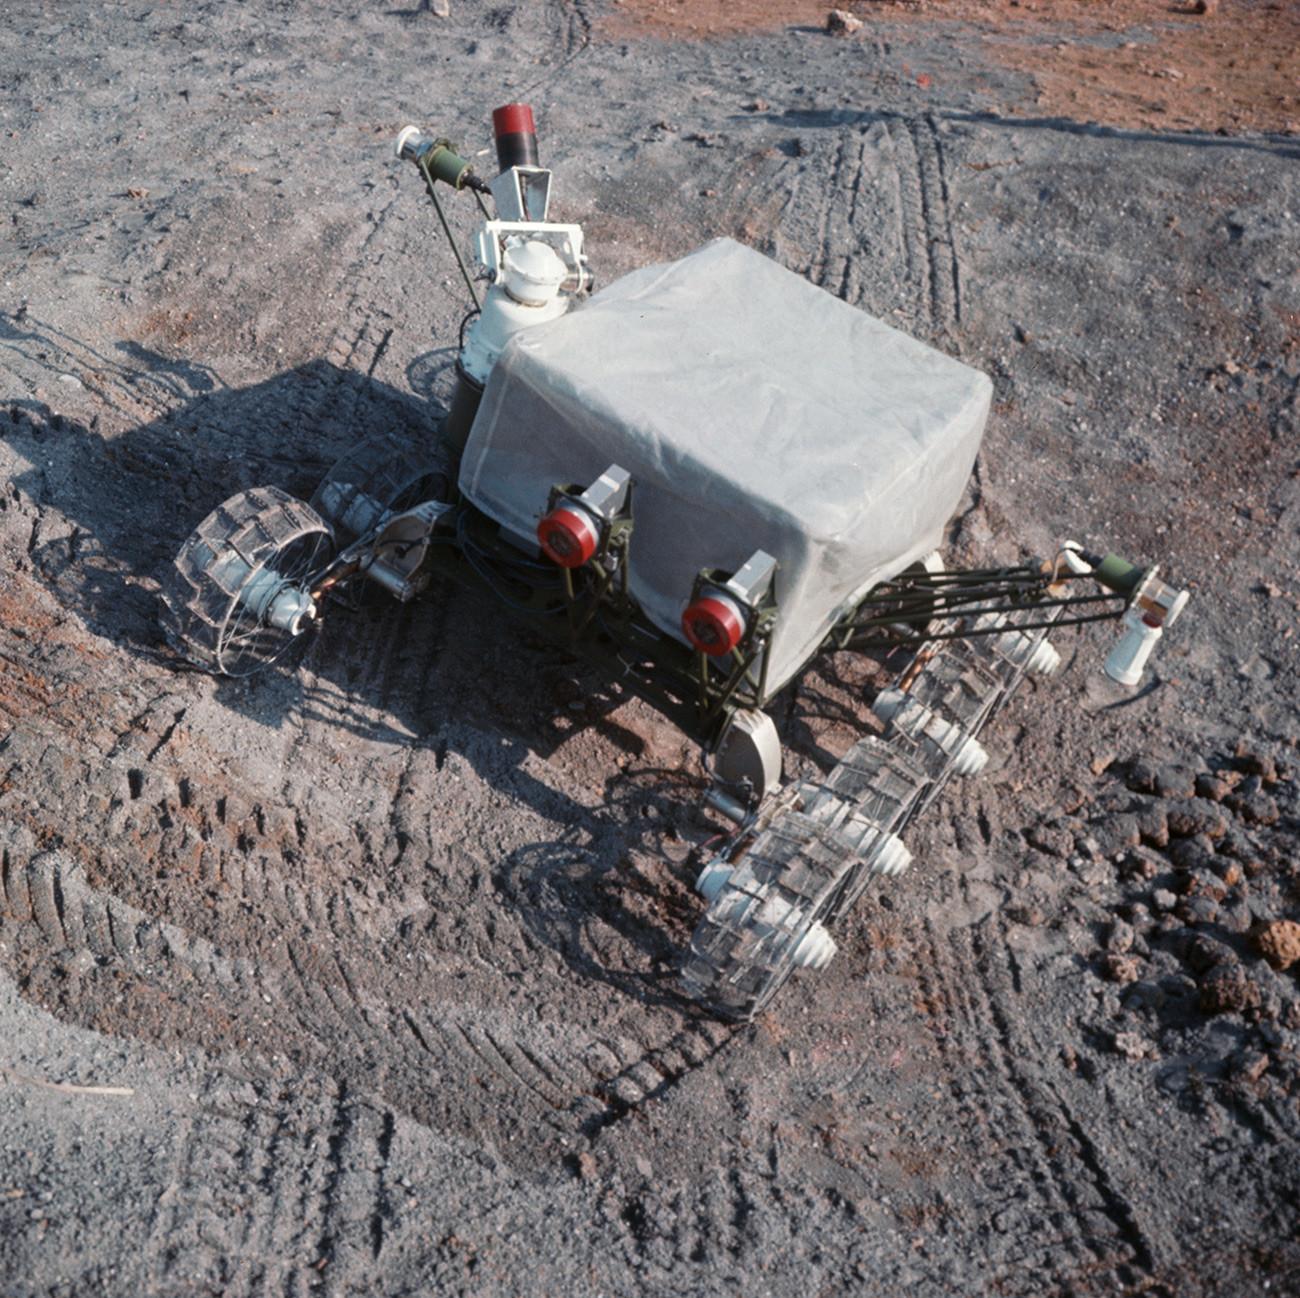 Lunarni rover Lunohod 1